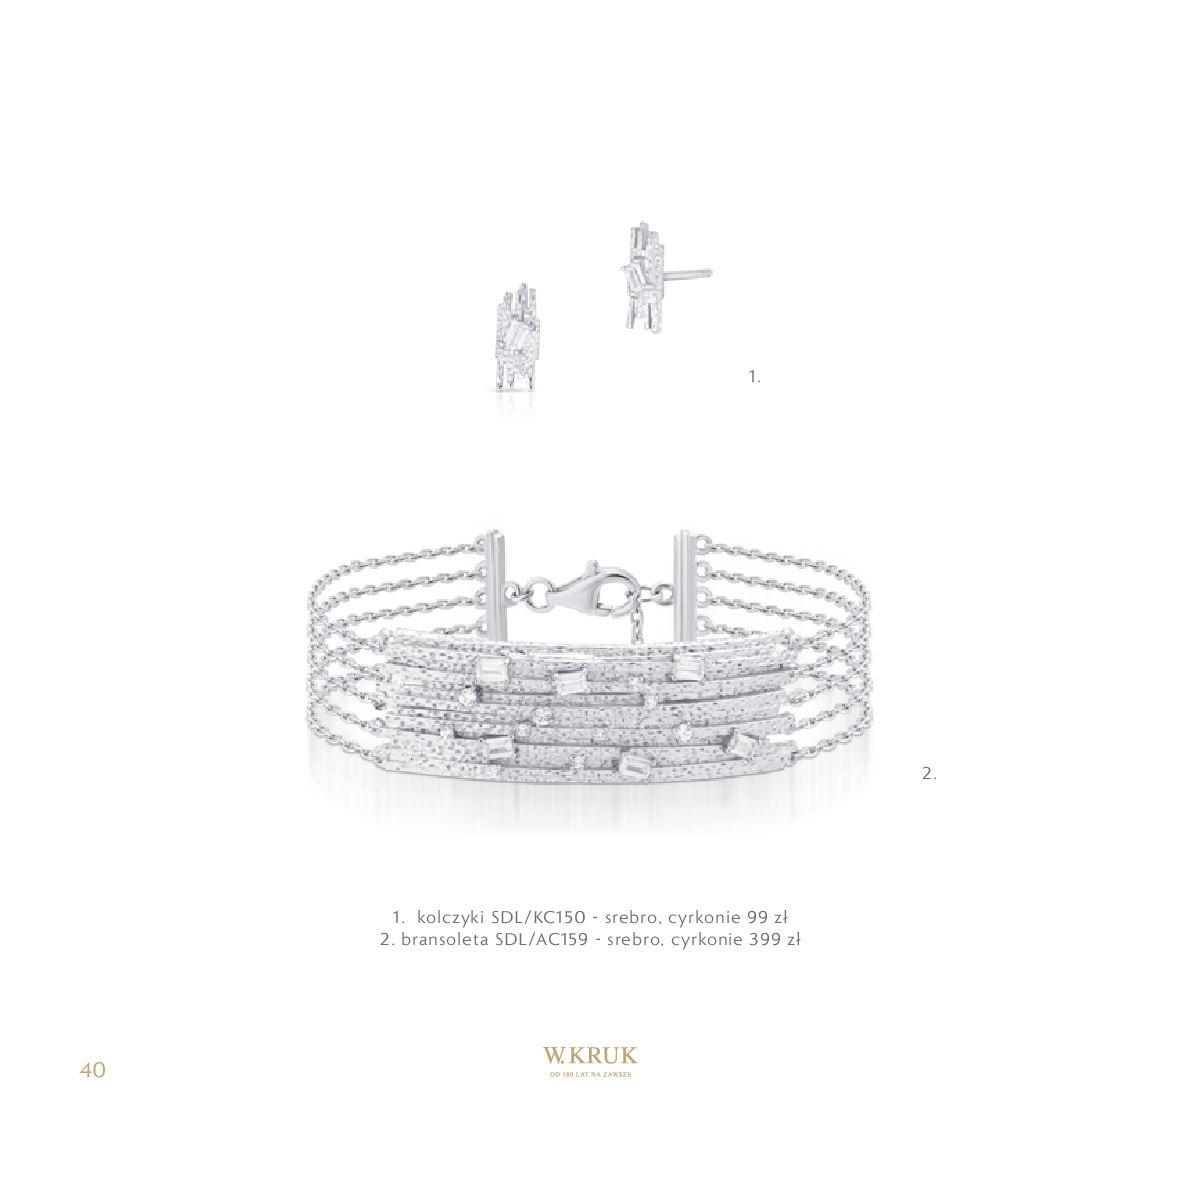 Gazetka W. KRUK: Katalog - Kolekcja Blask 2021-02-17 page-41